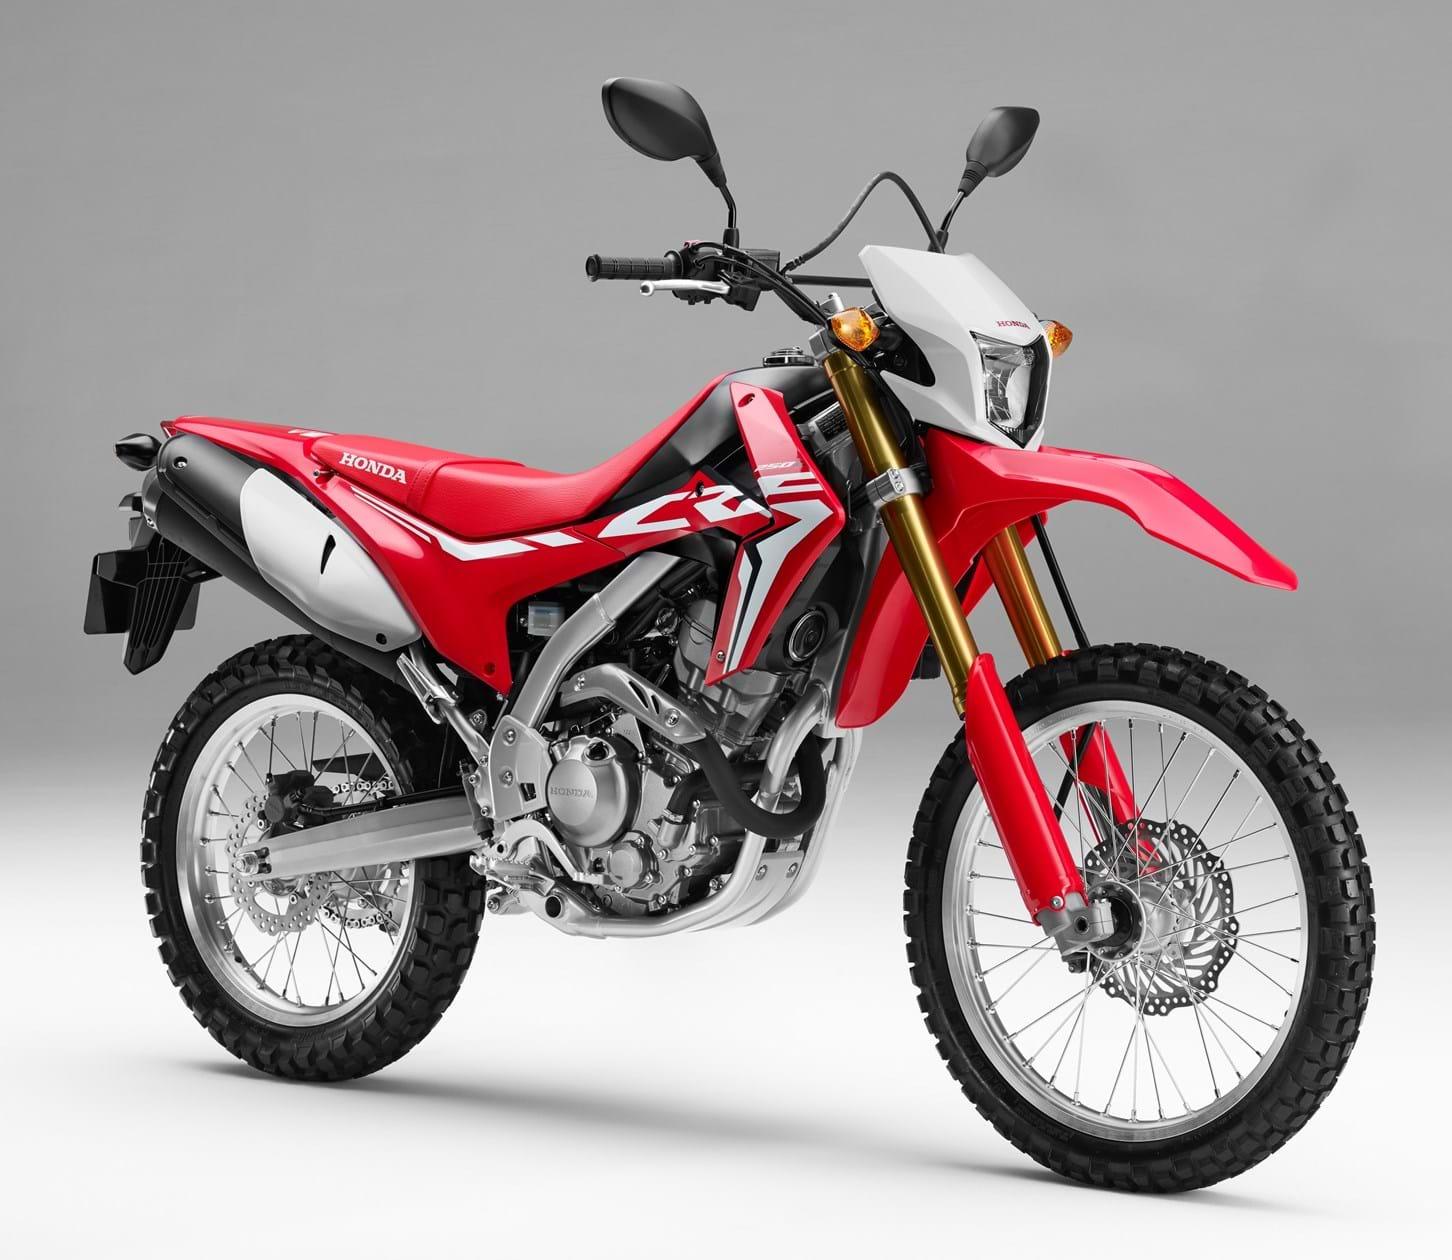 For Sale Honda Crf250l The Bike Market